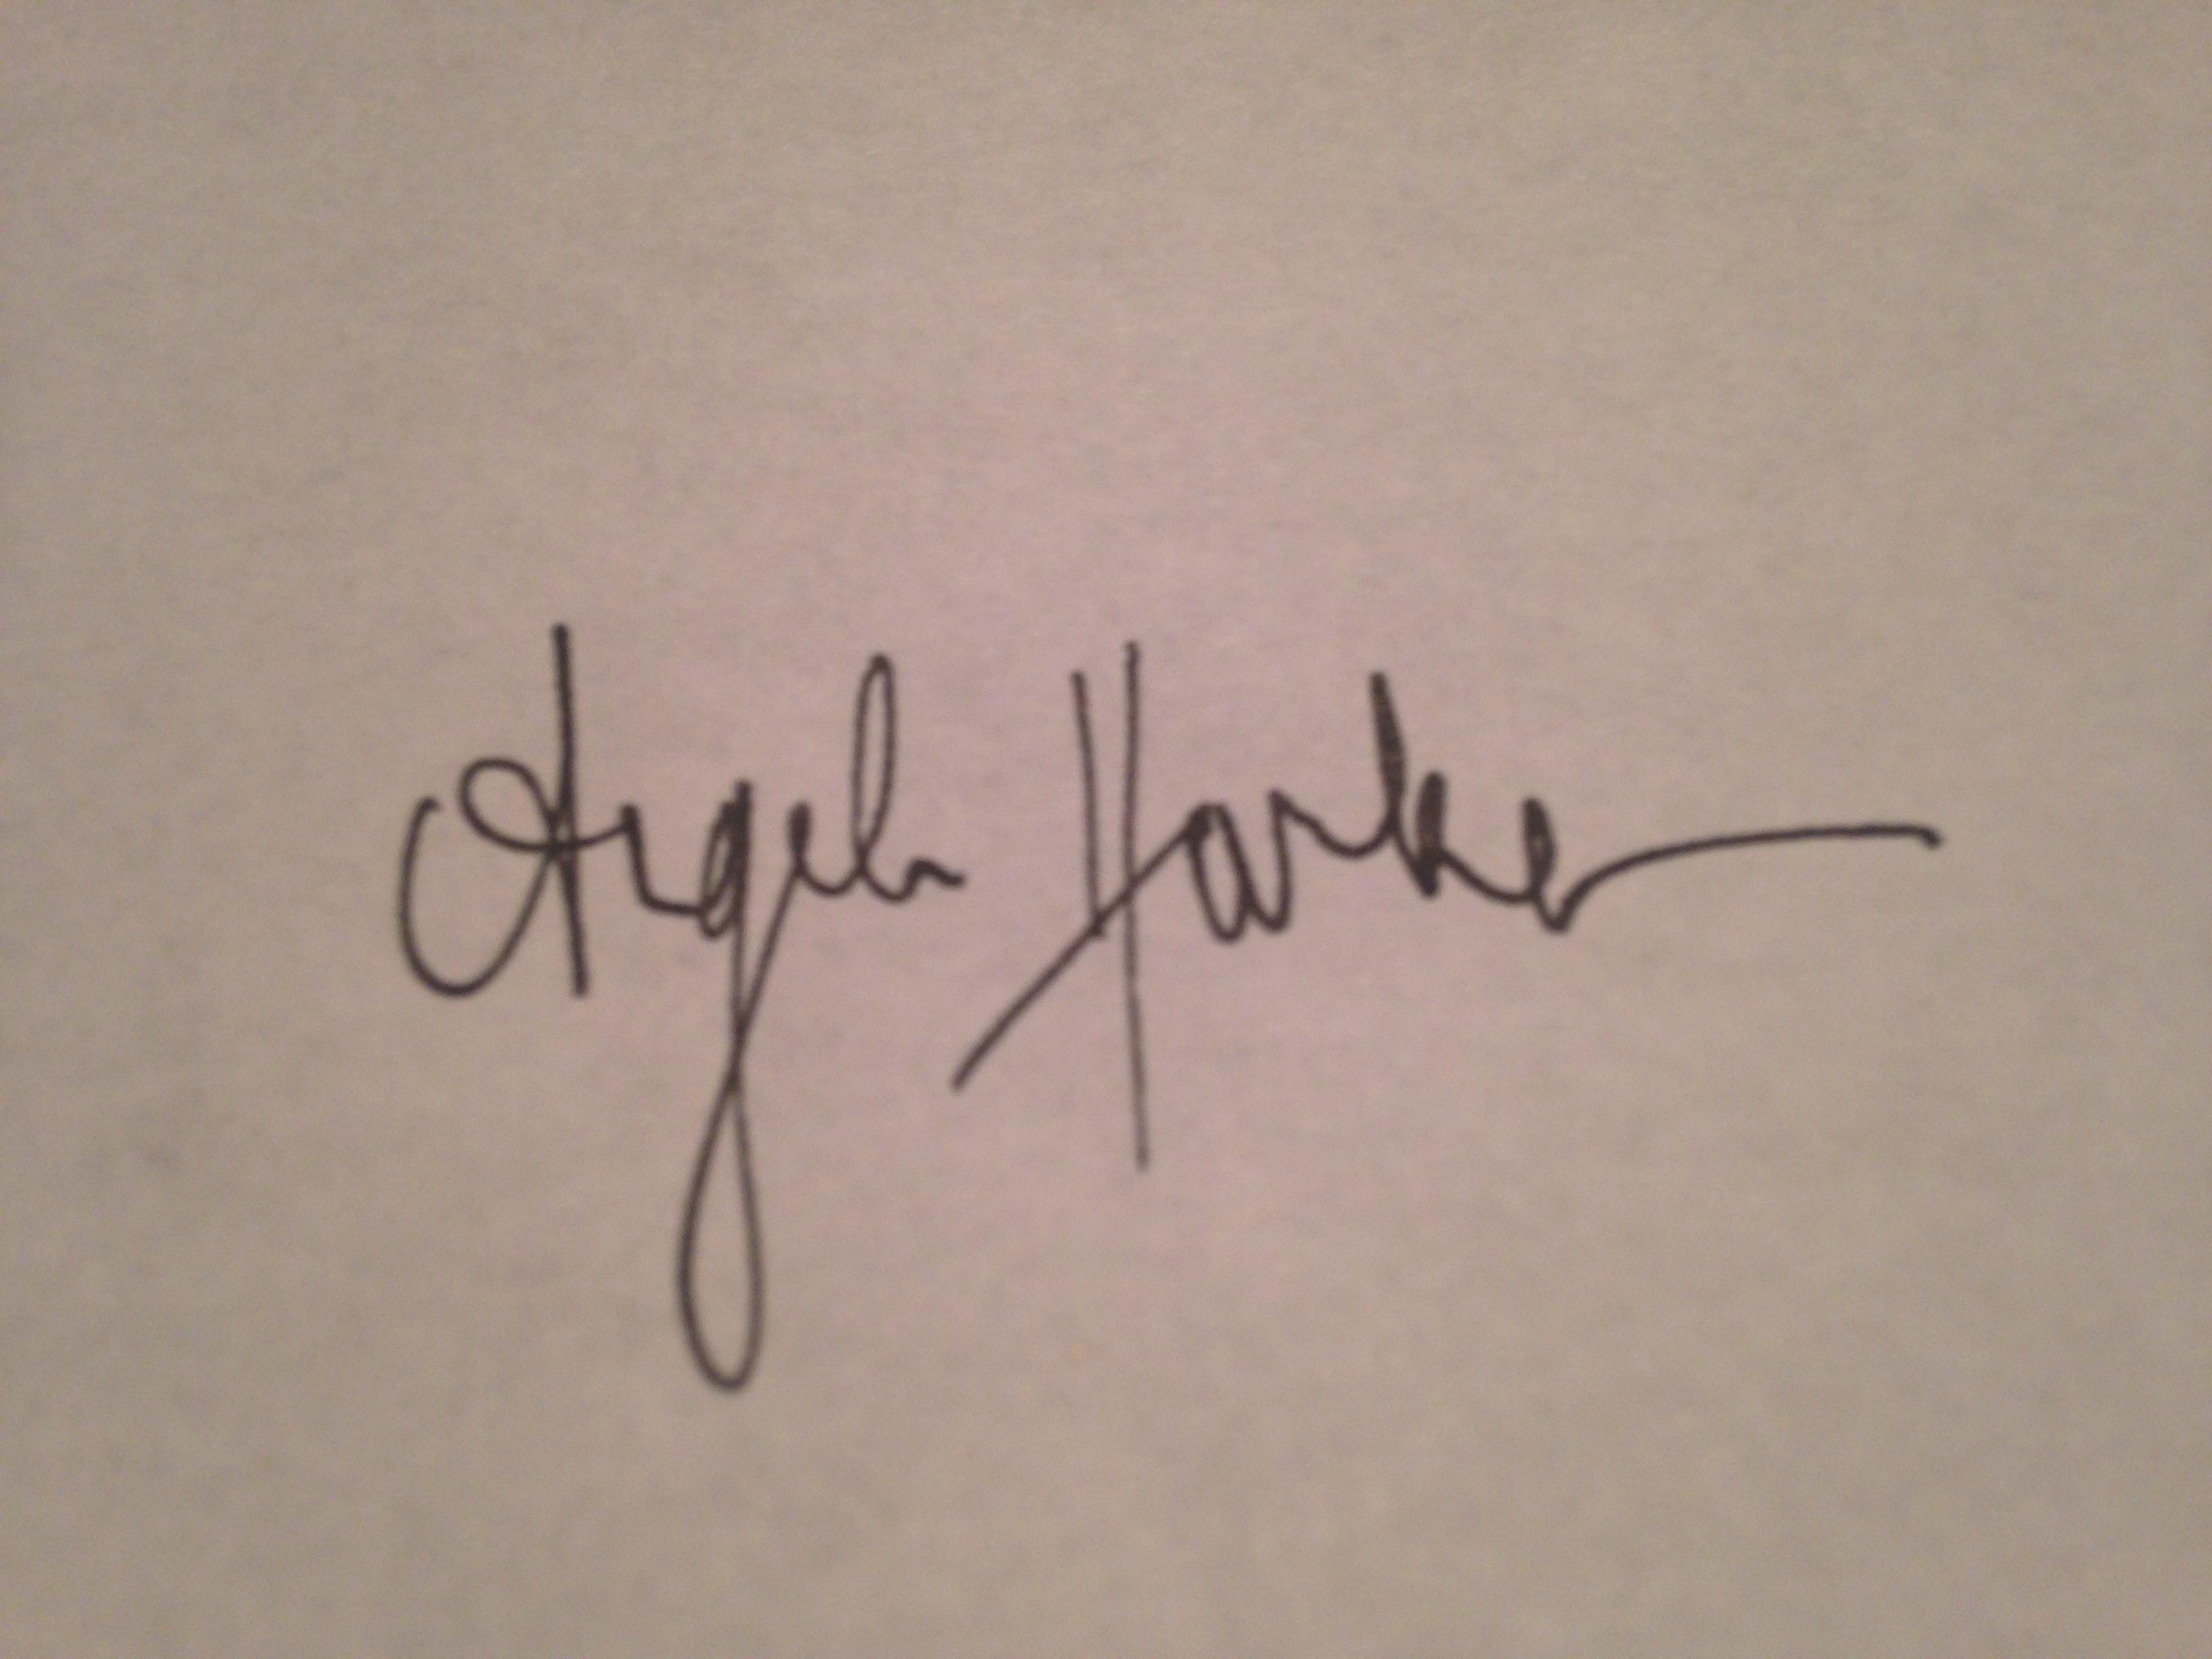 Angela Harken Signature